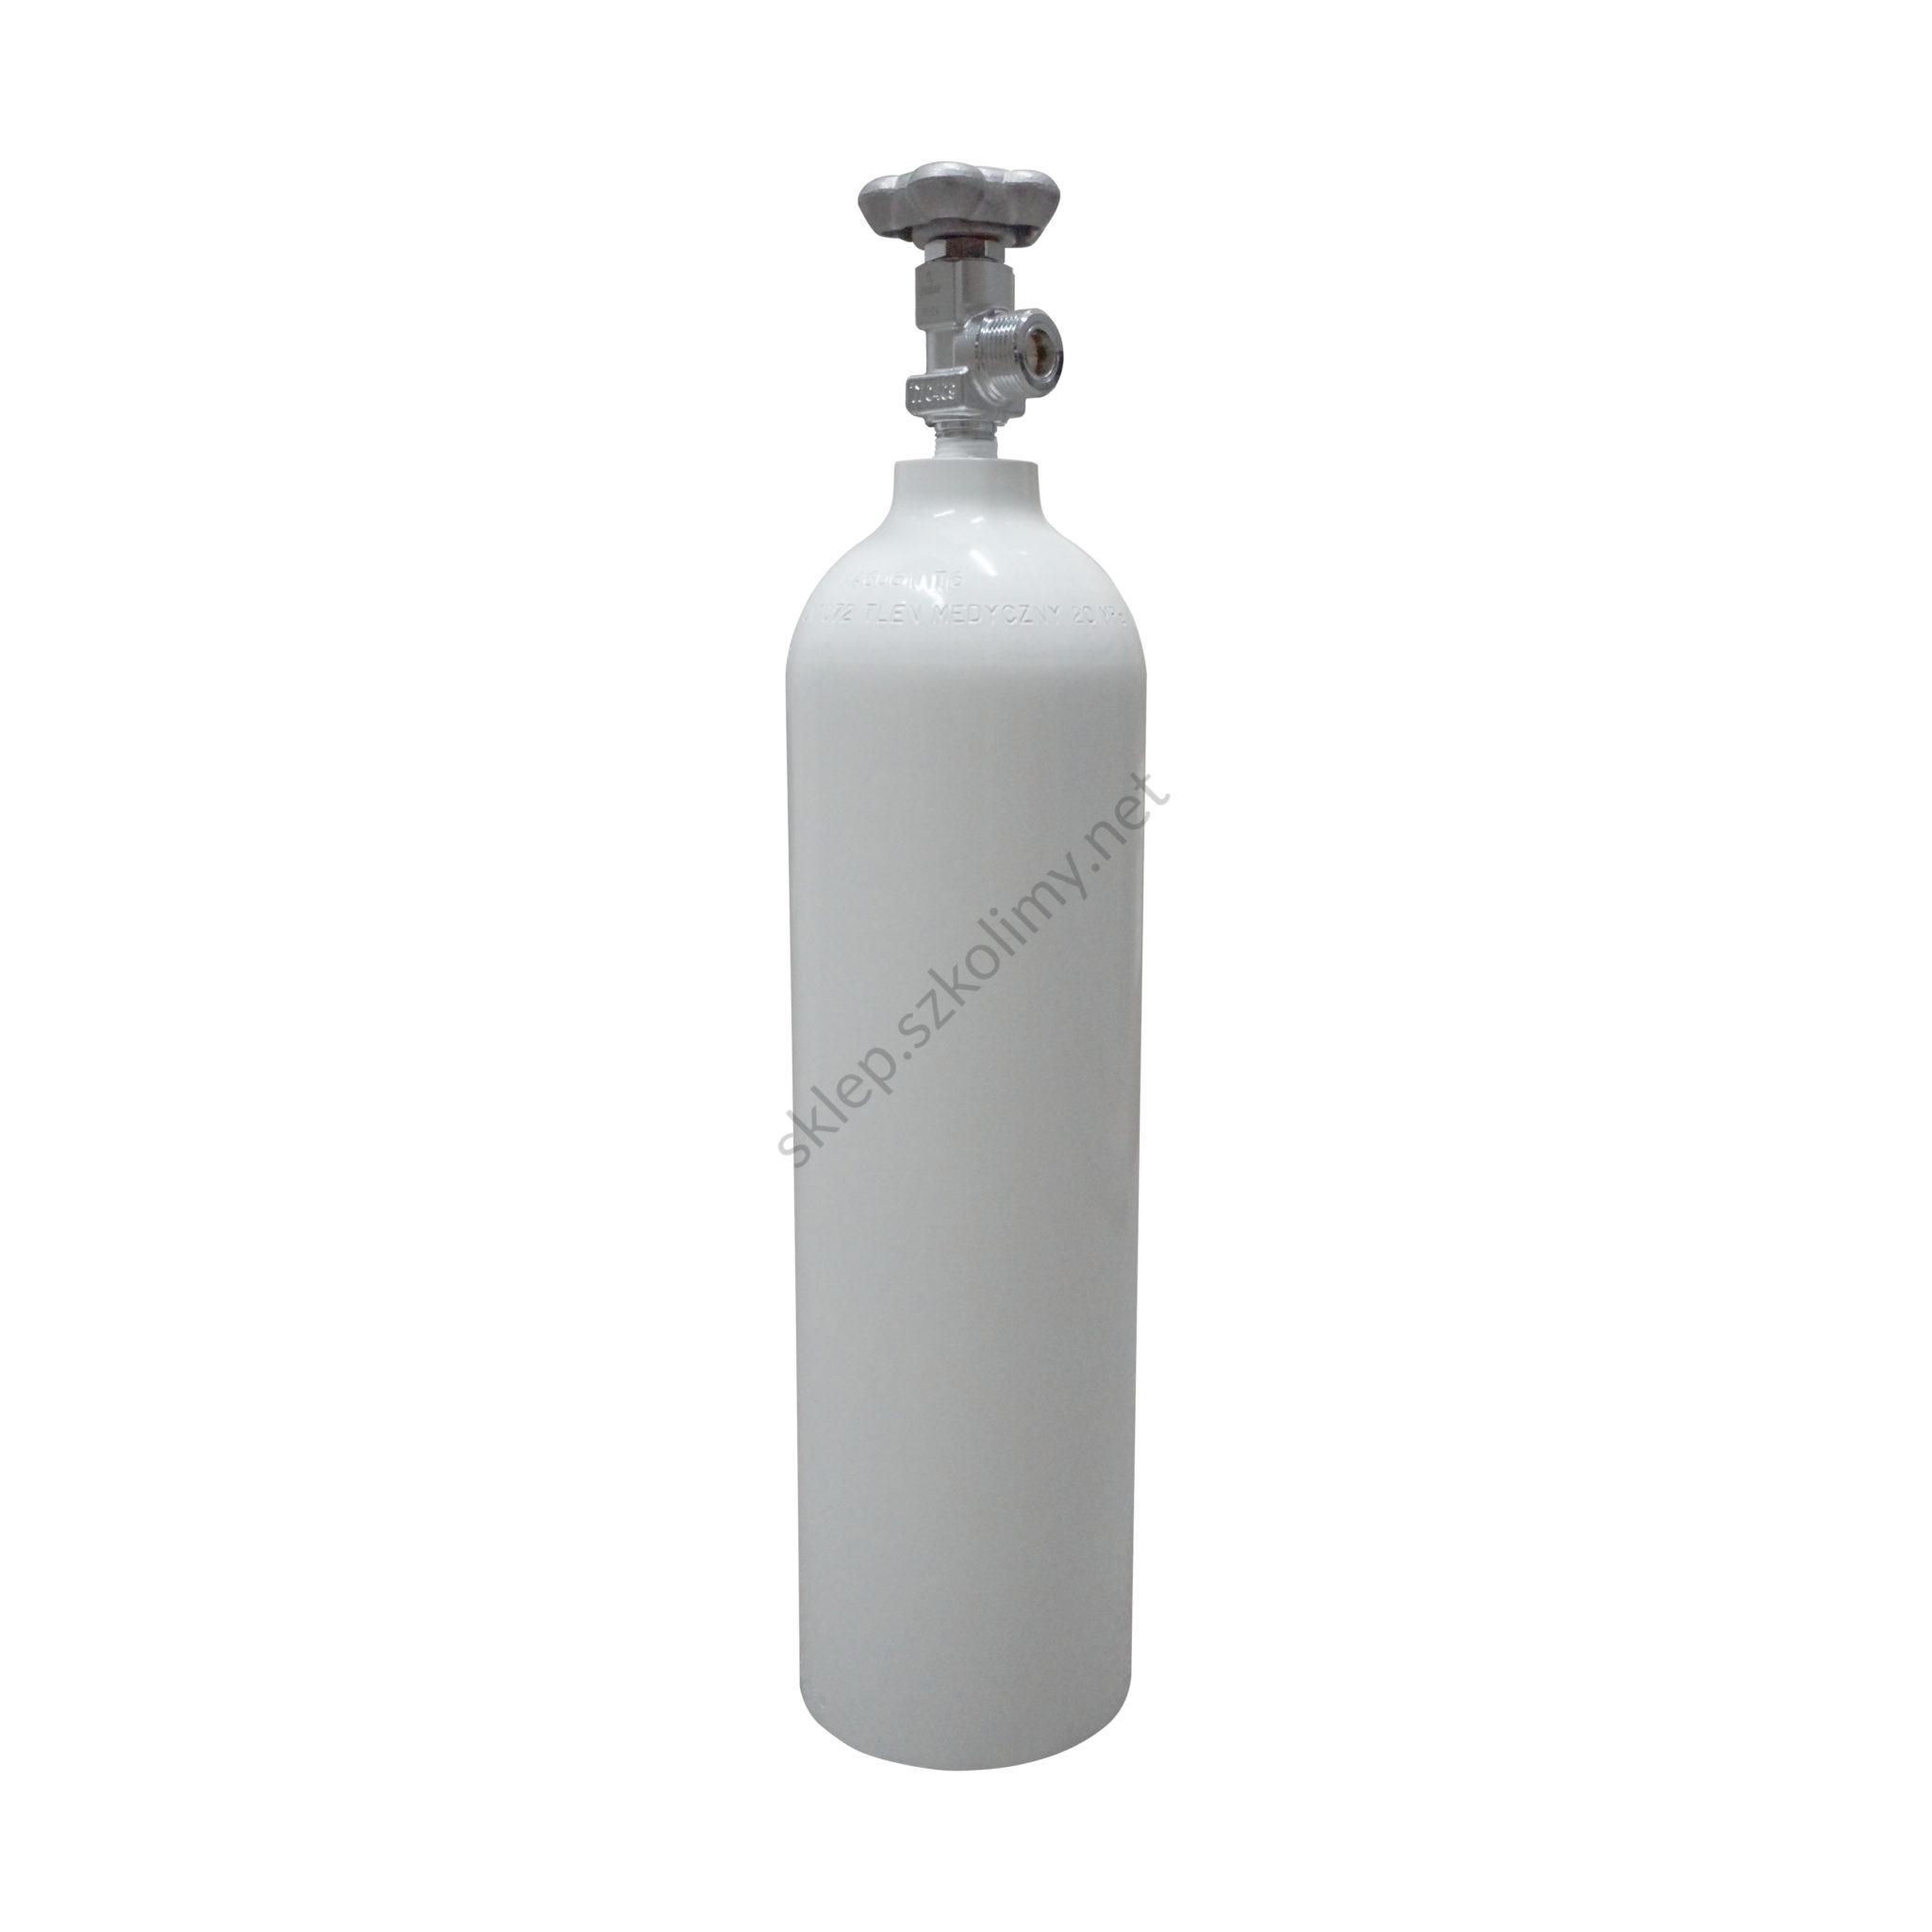 Butla tlenowa aluminiowa 2,7l